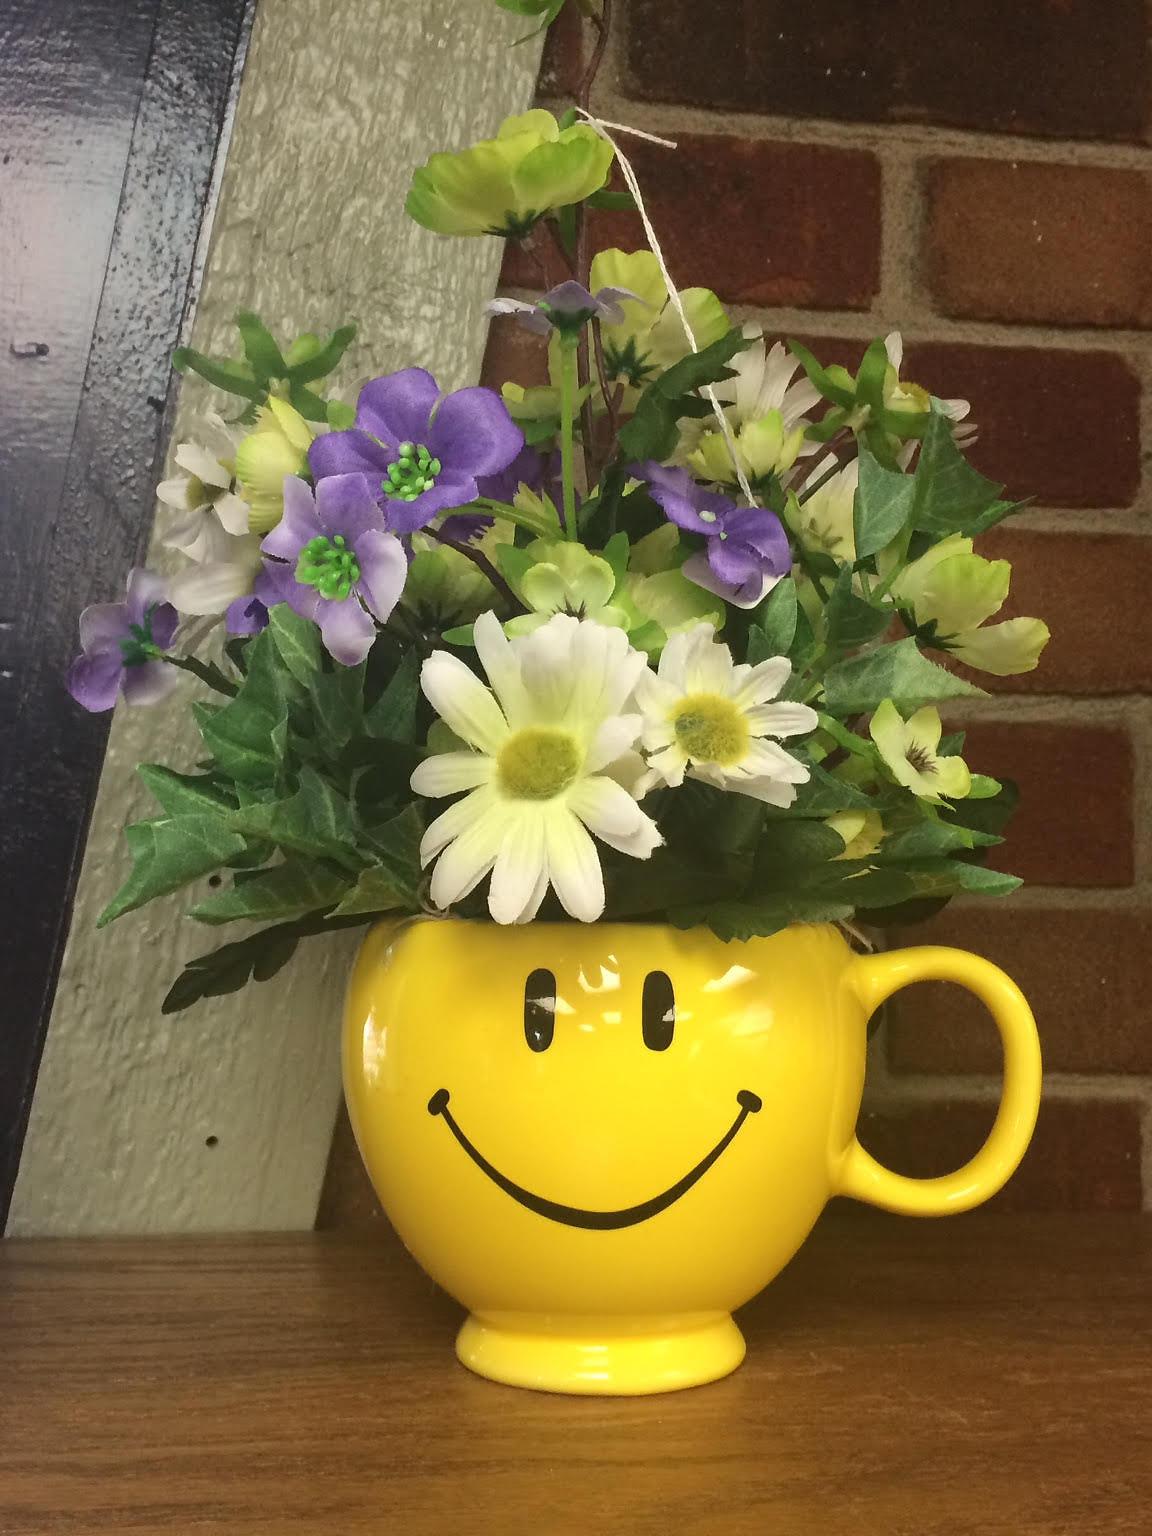 Smiley Face Flower Bouquet Choice Image - Flower Wallpaper HD